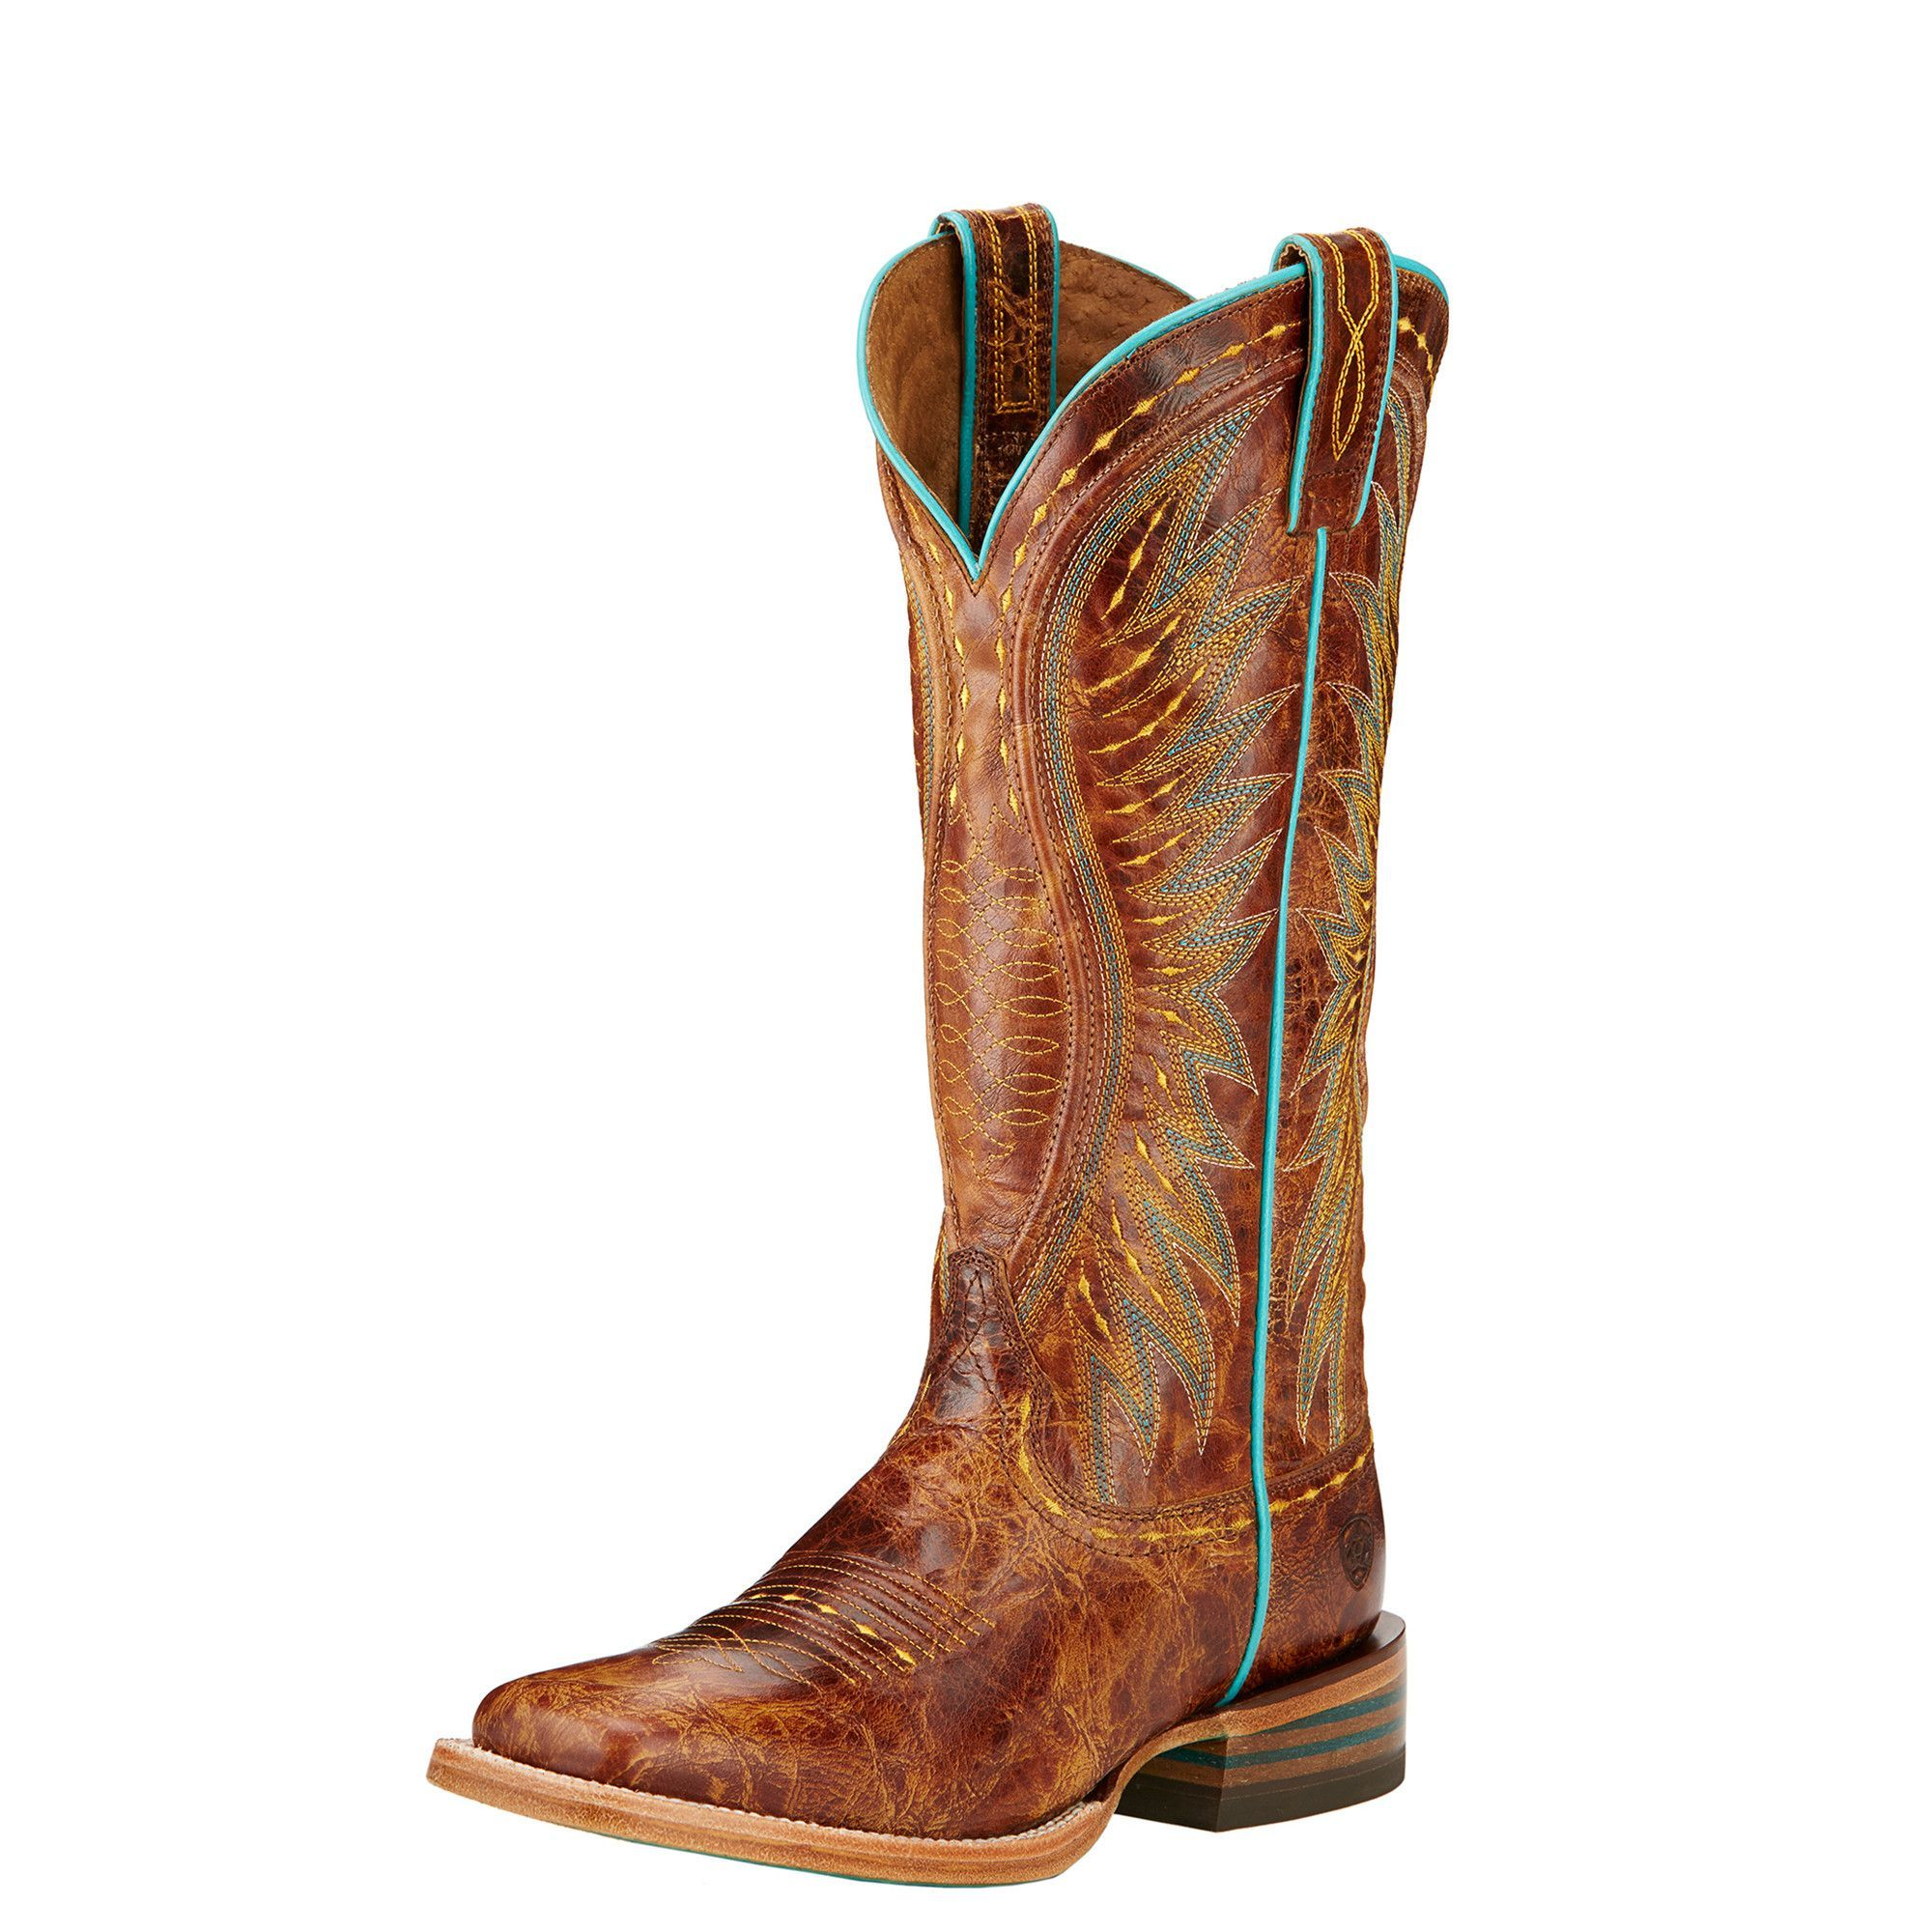 0f9e24d8db2 Ariat Women's Saddle Tan Vaquera Square Toe Boots | Outfits ...